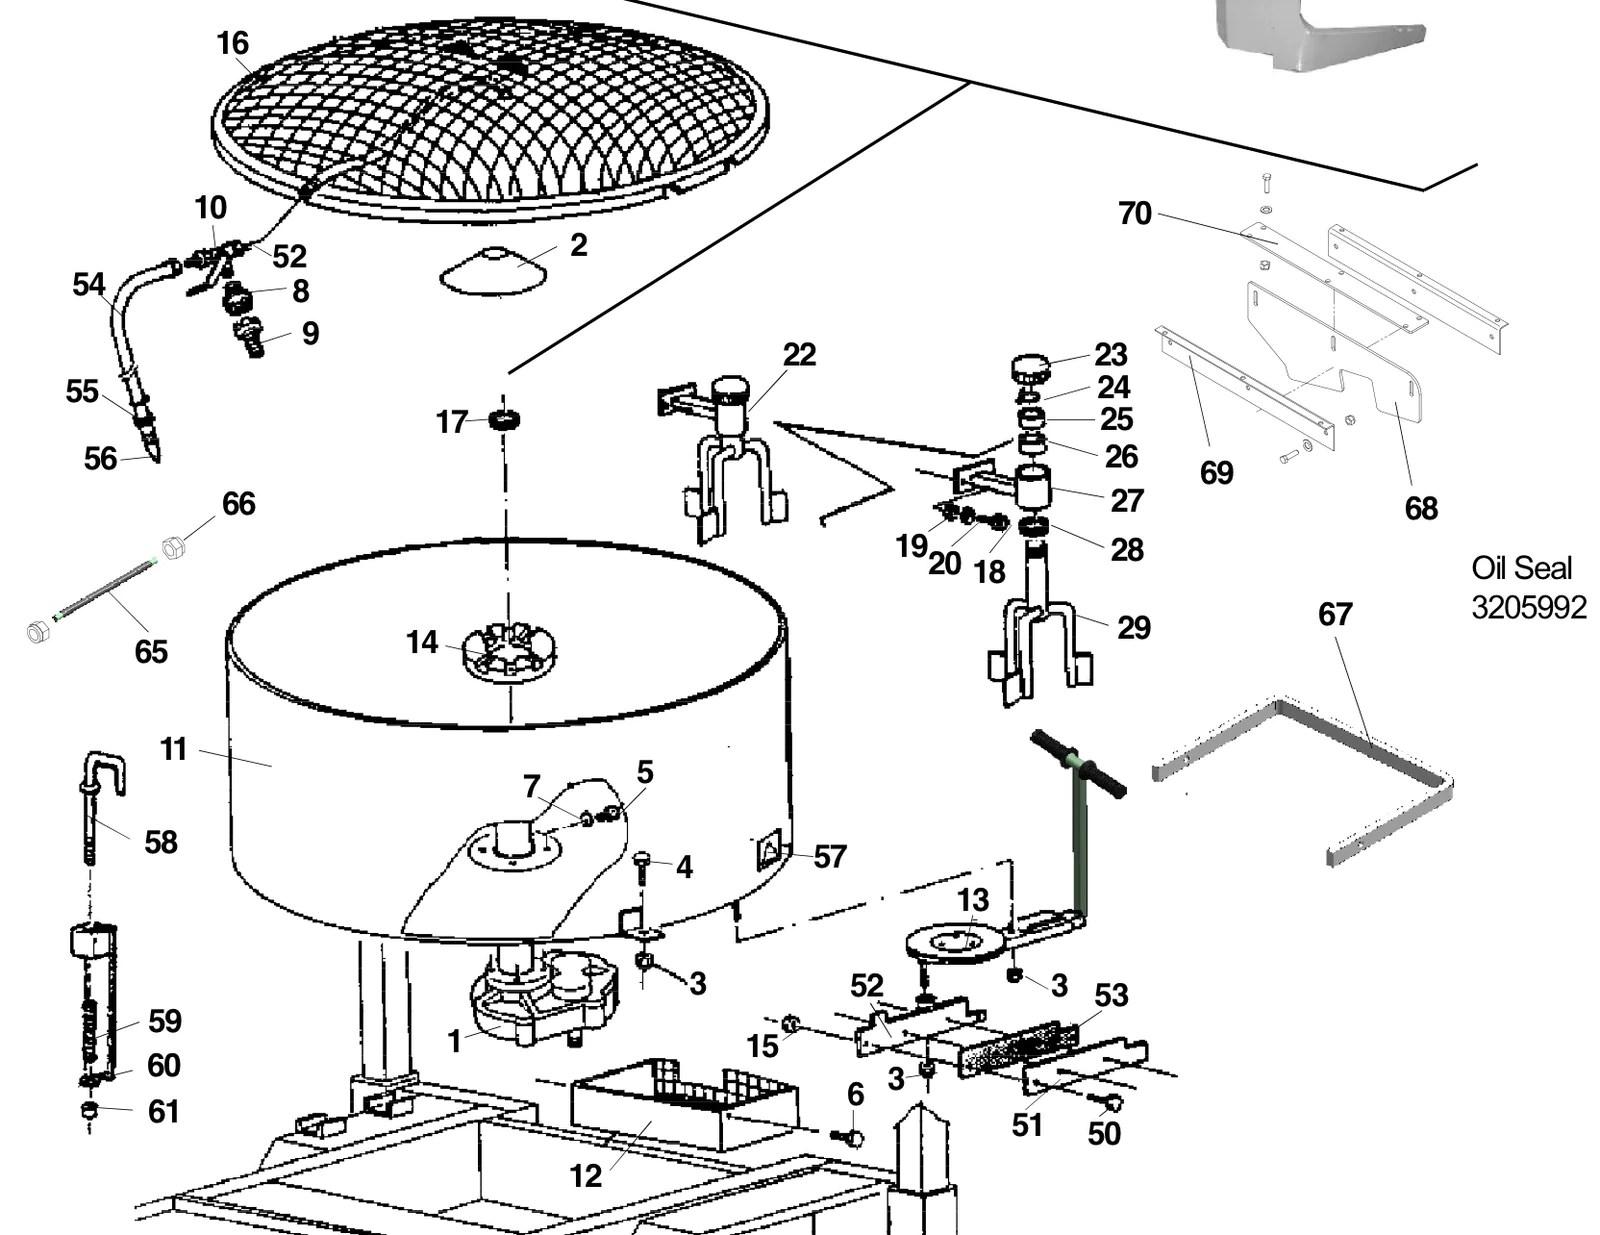 medium resolution of mortarman 750 mixer ball valve pn 2218068 10 in schematic drawing